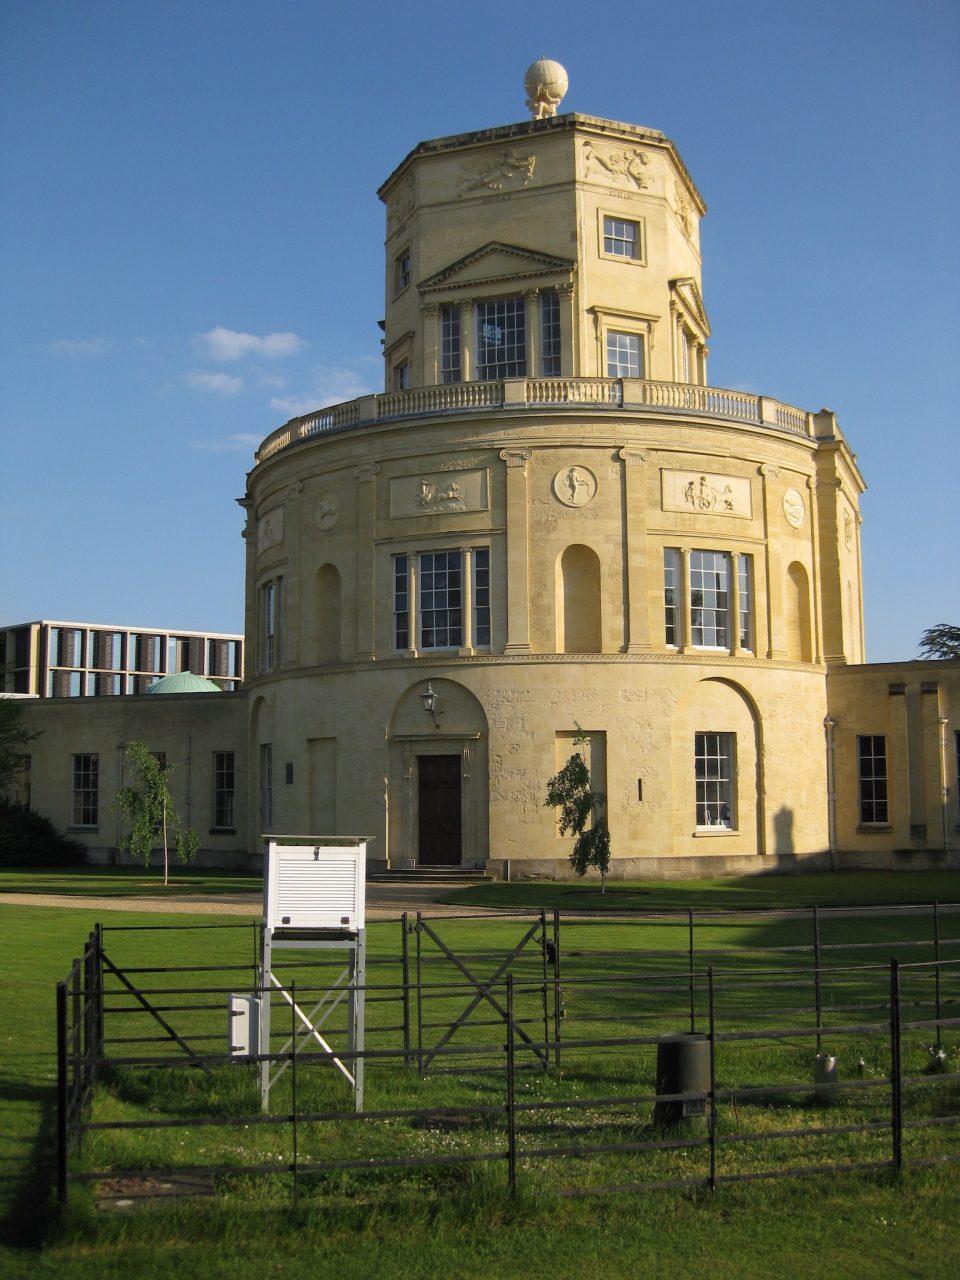 Radcliffe Meterological Station and Observatory